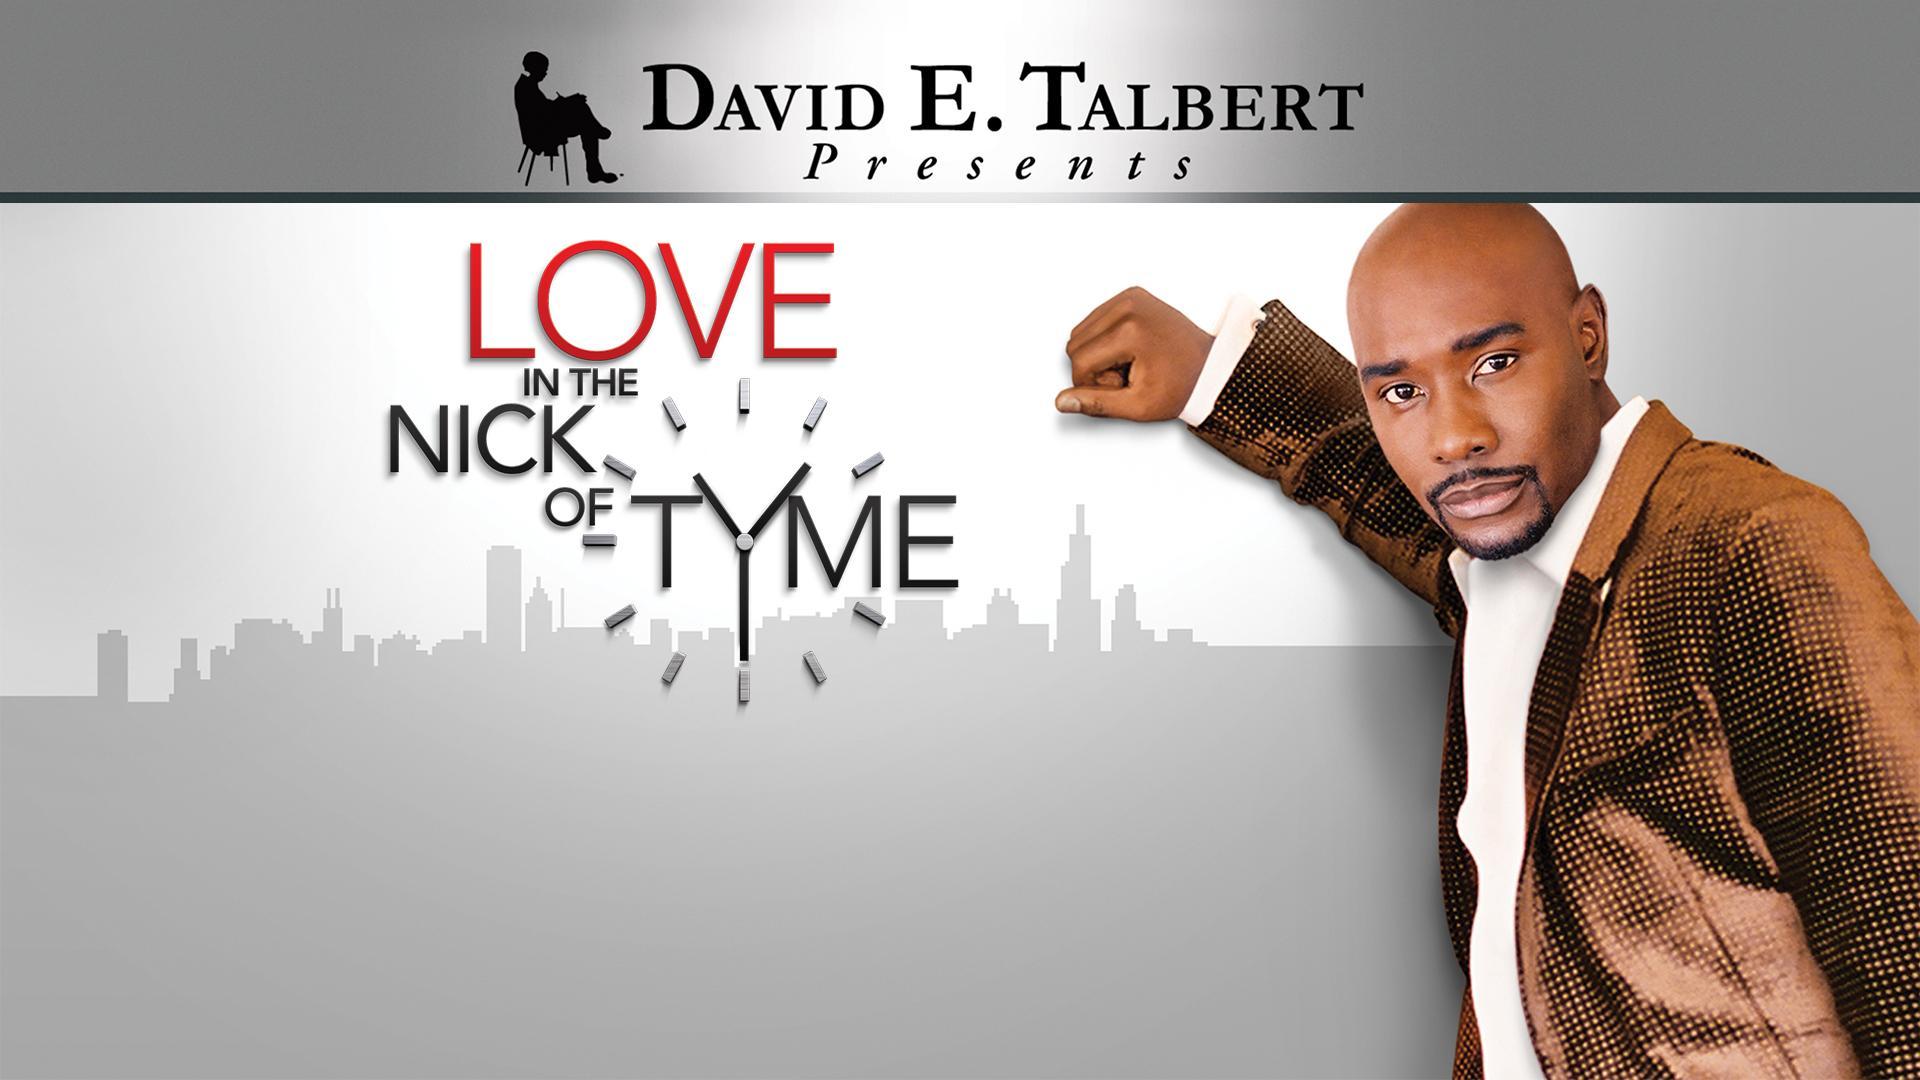 david-e-talberts-love-nick-tyme